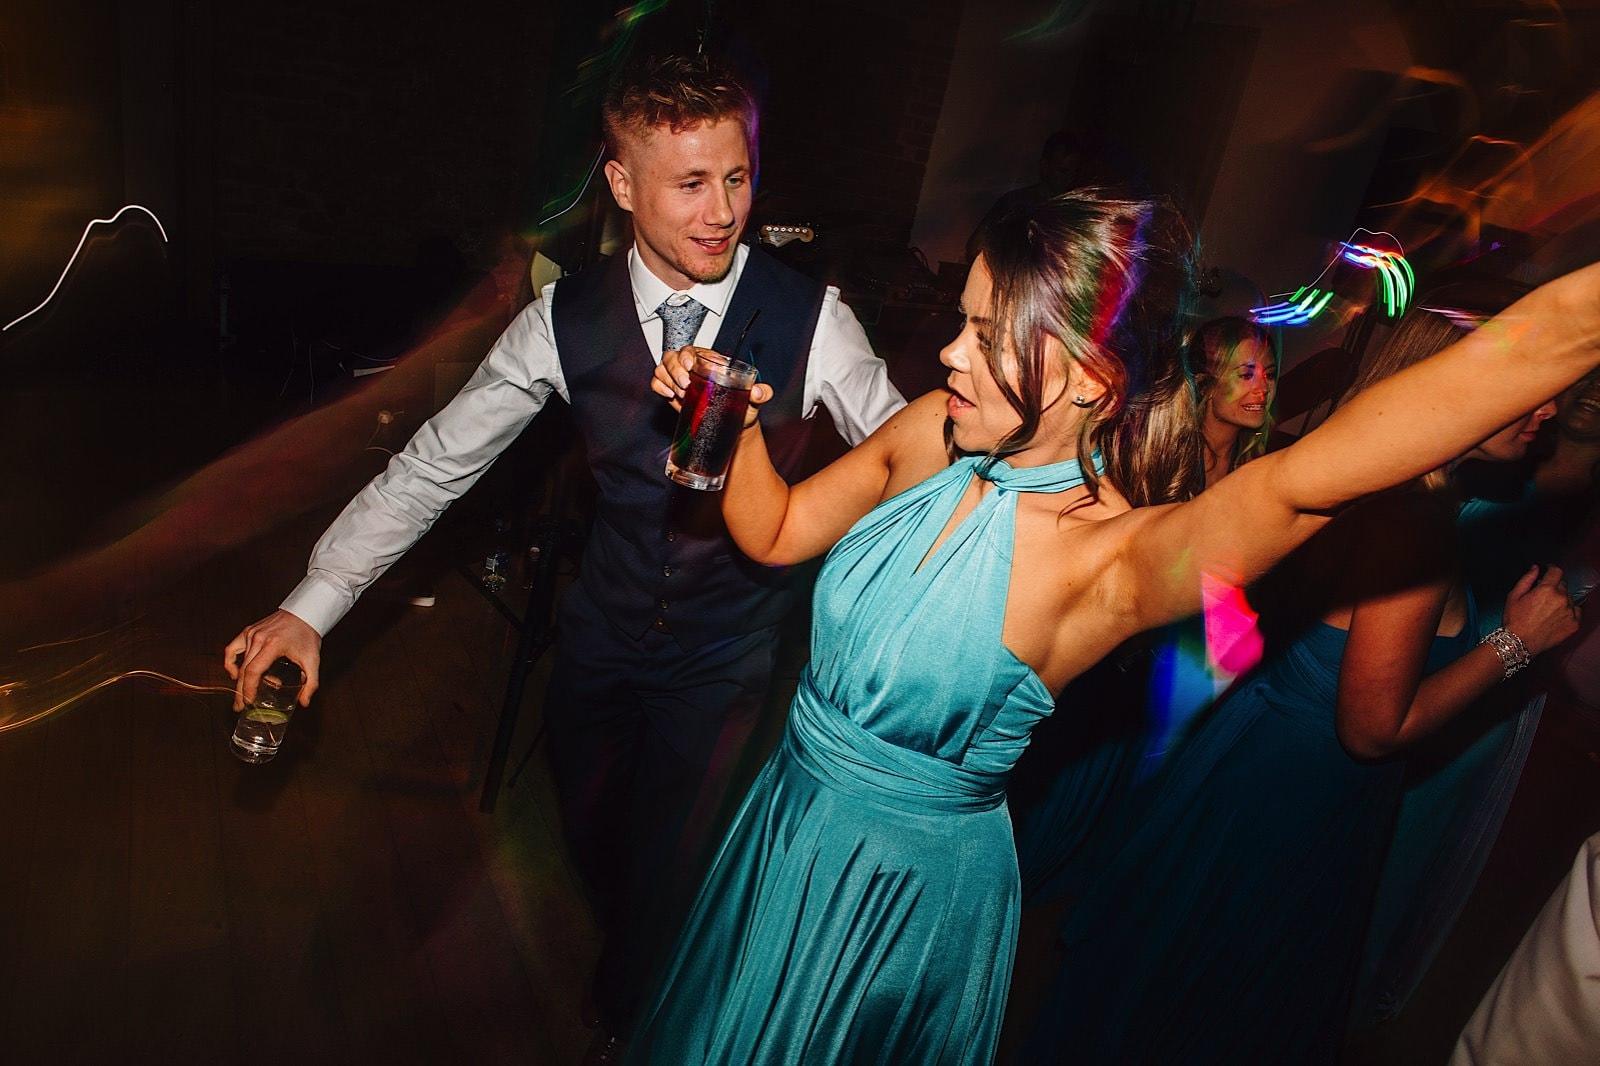 dodford manor northamptonshire wedding photography 0076